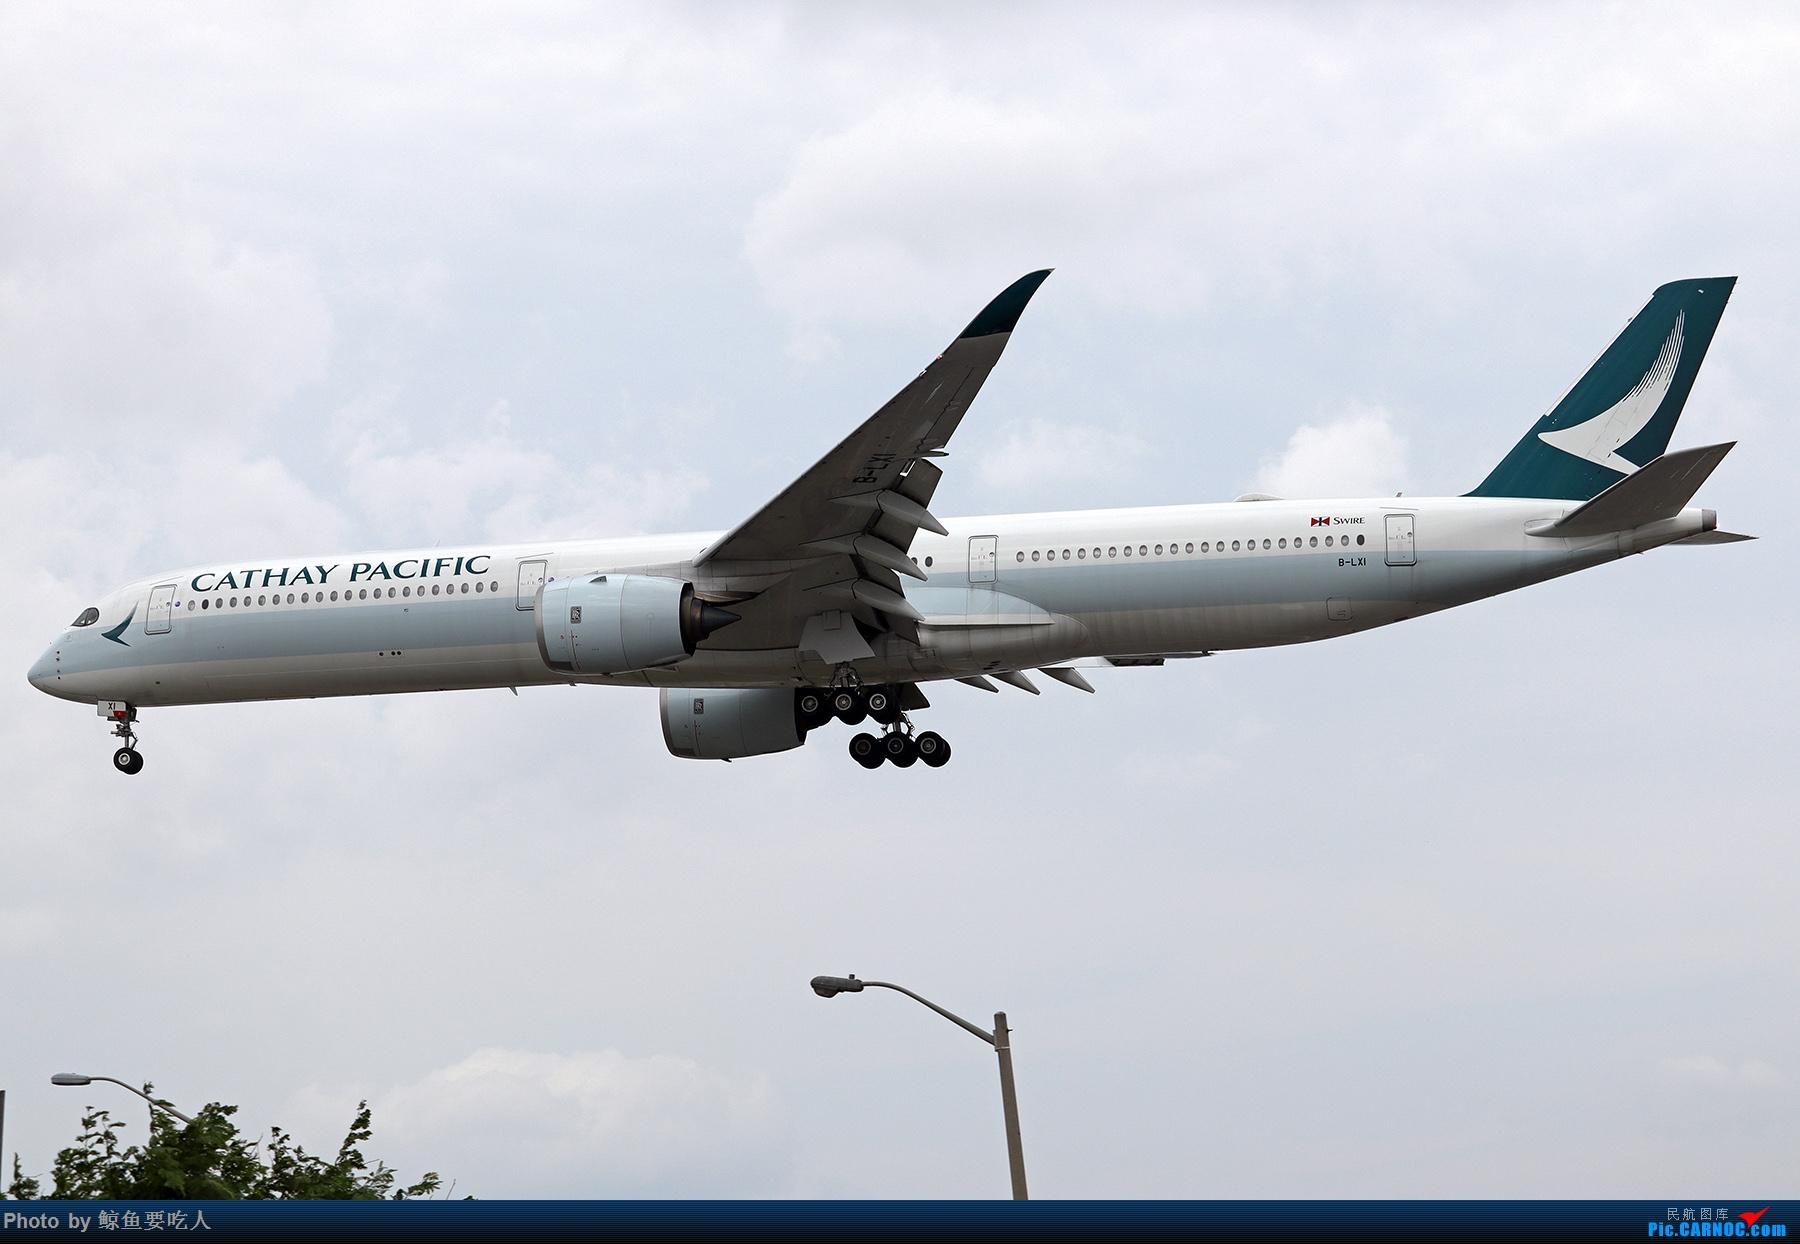 Re:[原创]【多图党】见证疫情后逐步的恢复,加拿大夏日多伦多皮尔逊机场拍机~ 乐见诸航空公司复航多伦多 AIRBUS A350 B-LXI 多伦多皮尔逊国际机场